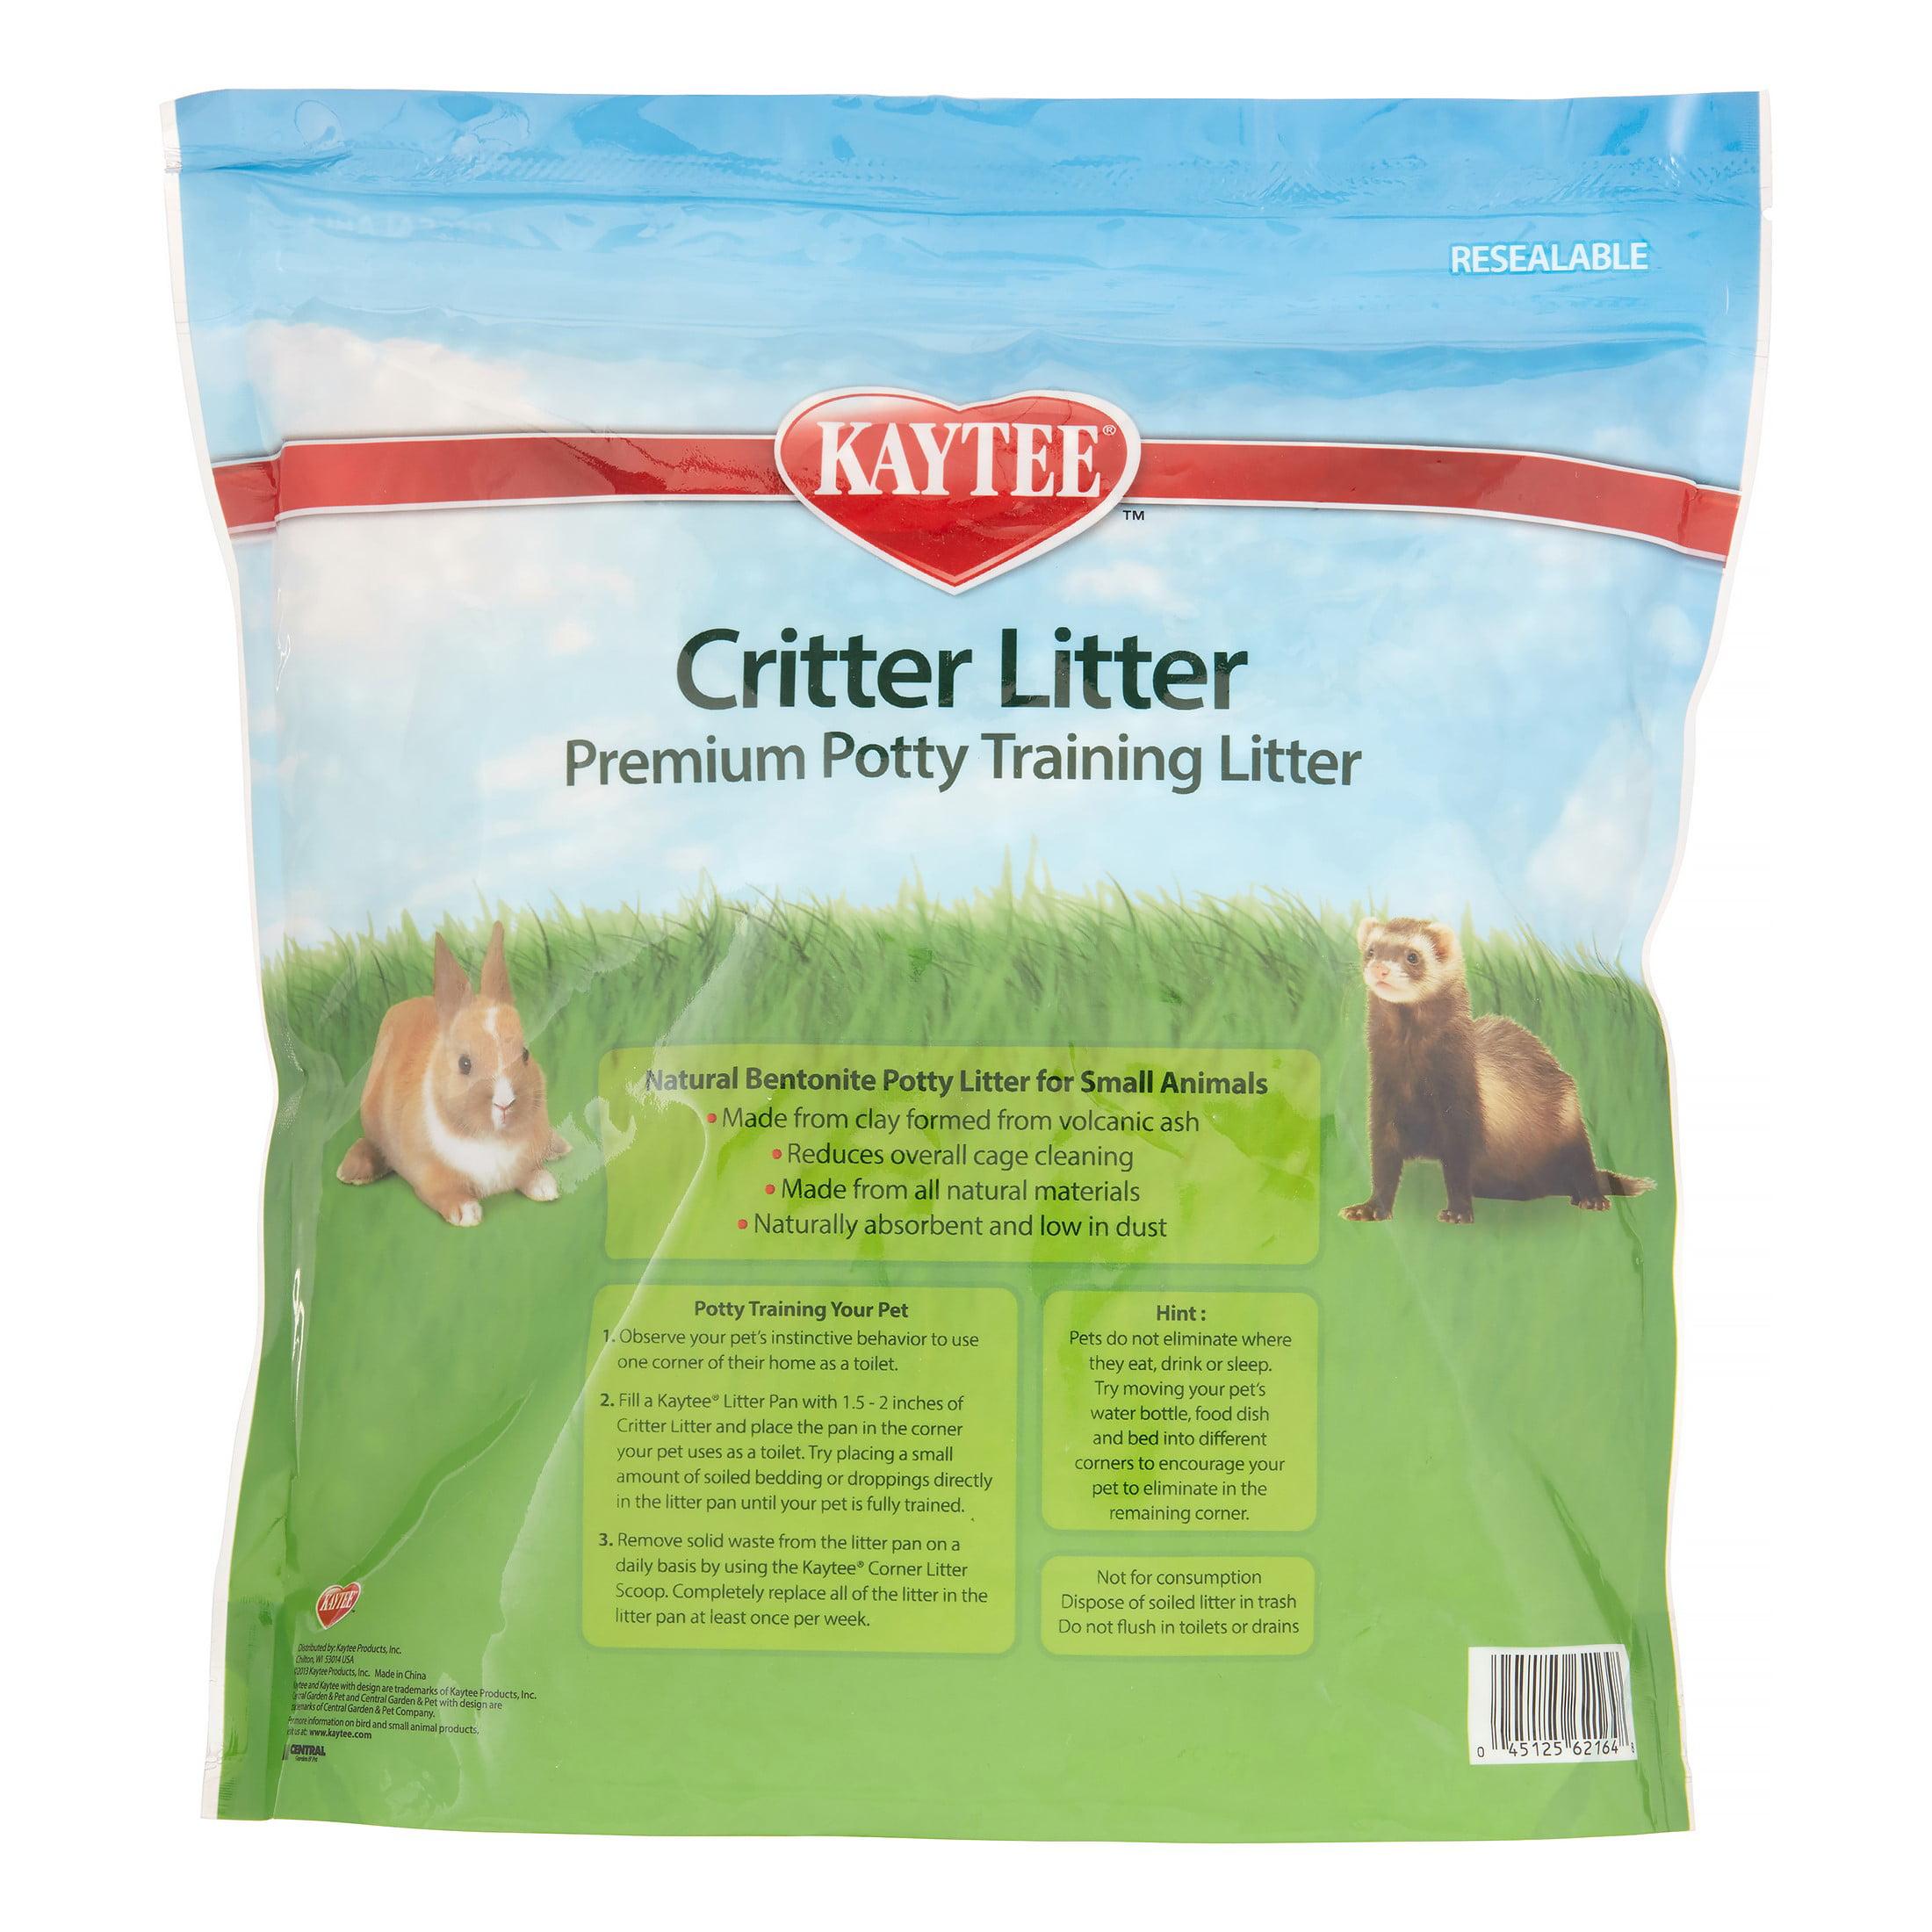 Kaytee Critter Litter Premium Potty Training Pearls, Small Animal Litter,  4-lb